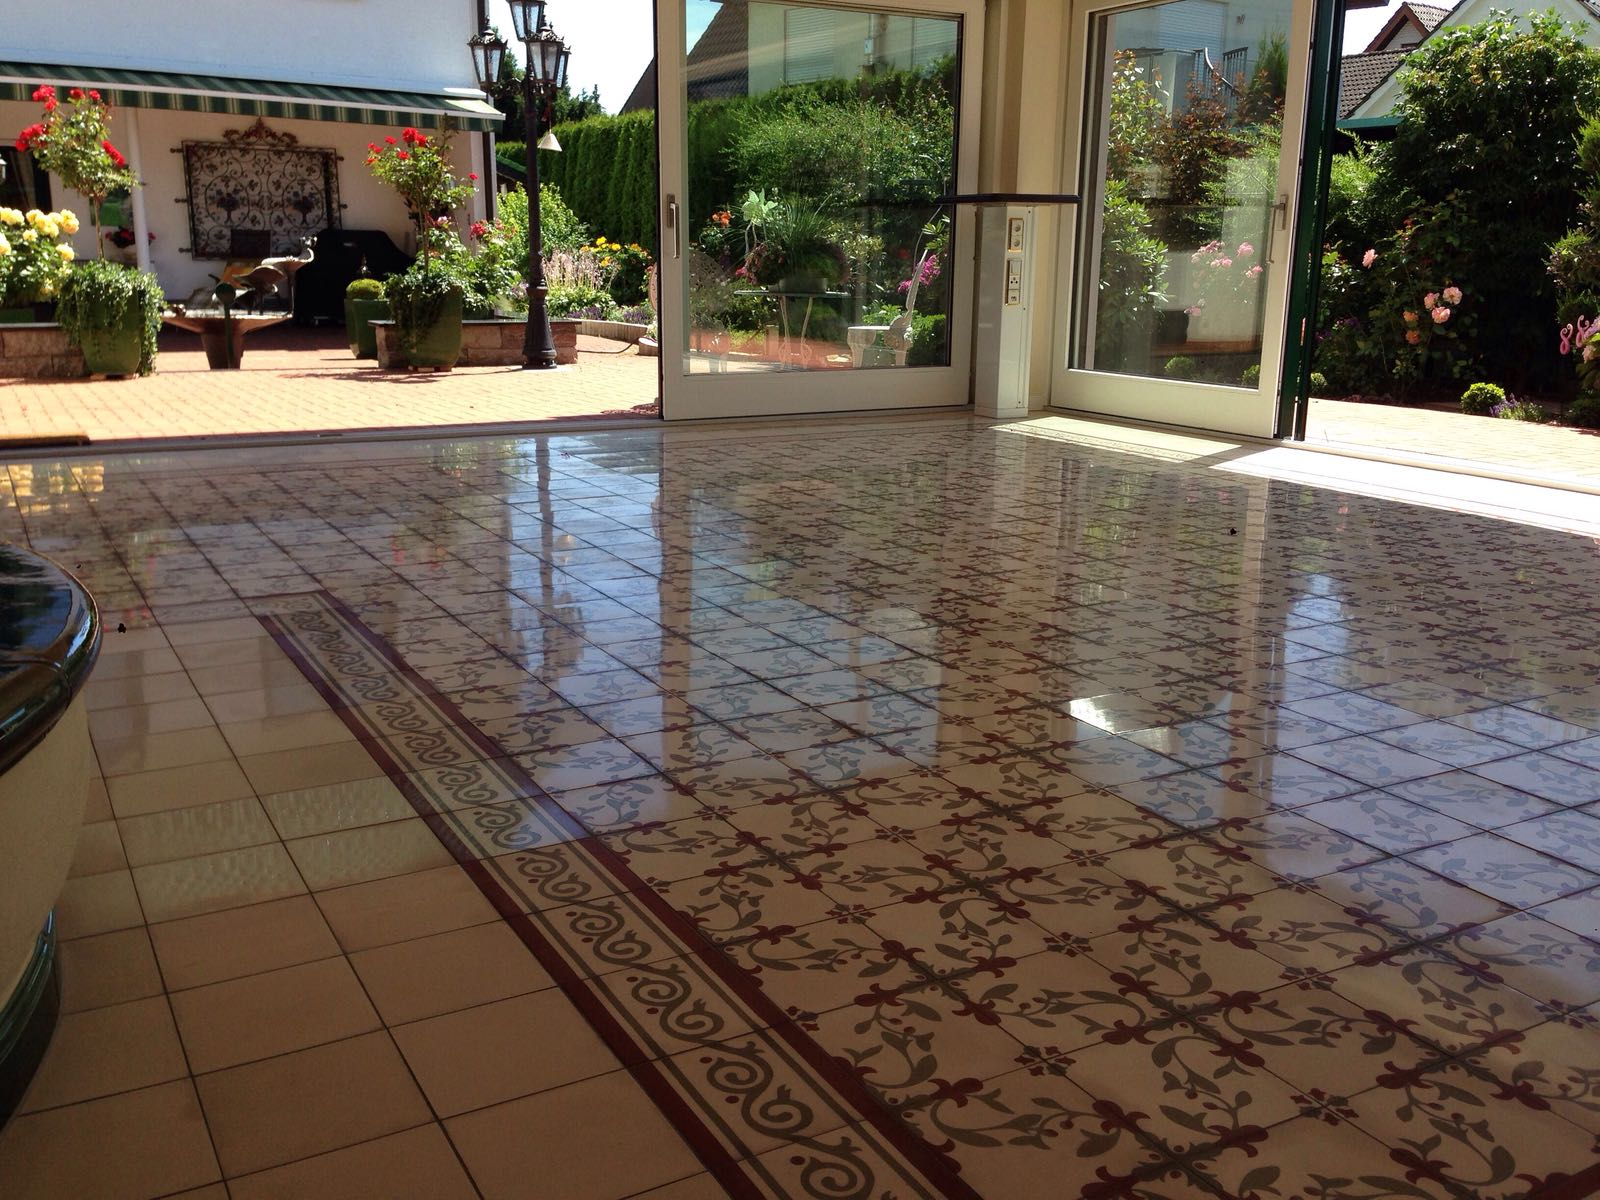 Mosaikfliesen   Rcs-Steinbodensanierung